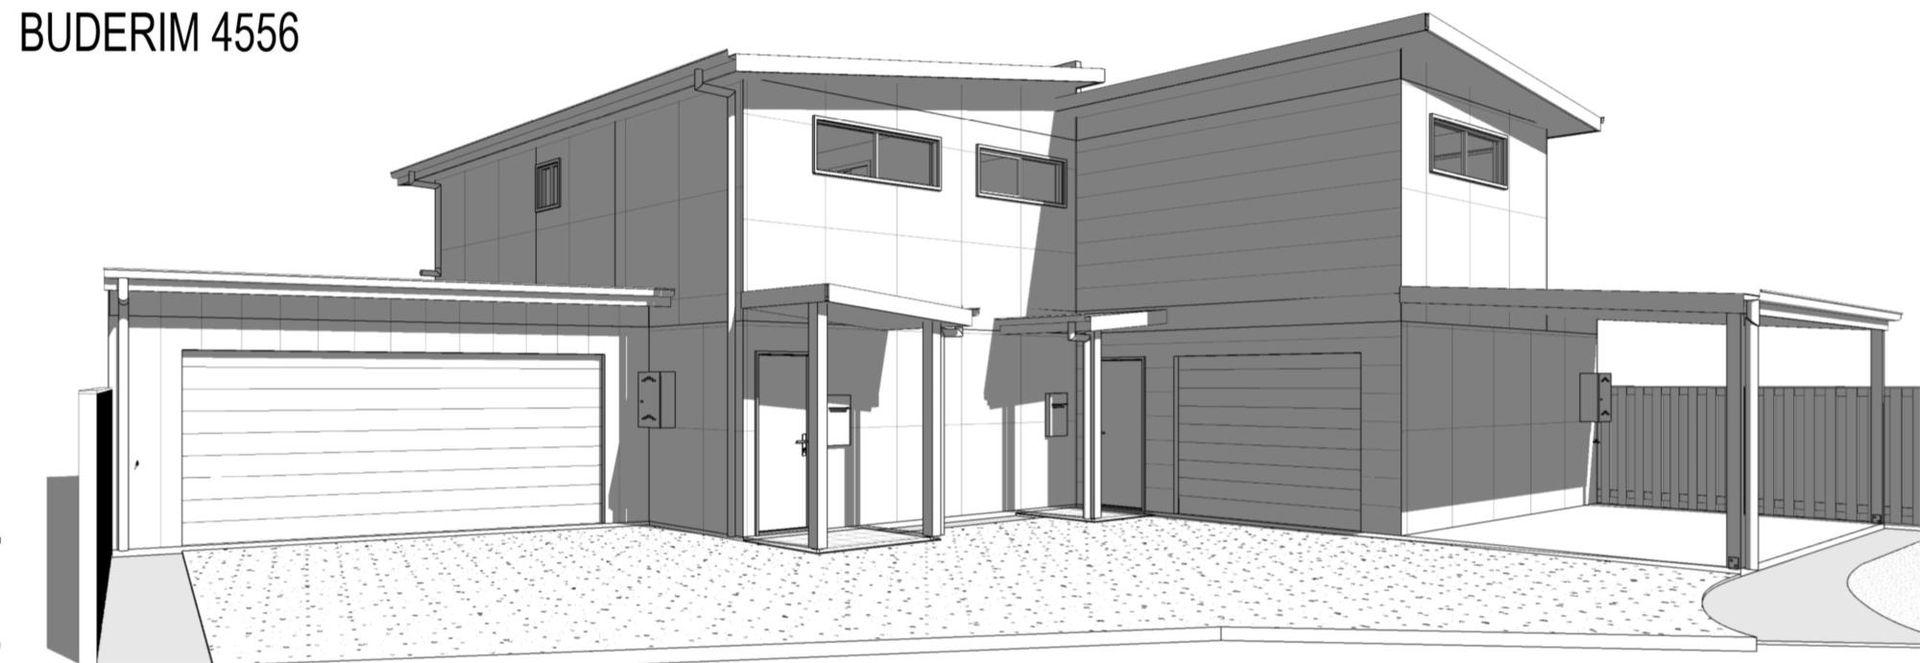 Lot 3/157 Stringybark Rd, Buderim QLD 4556, Image 0